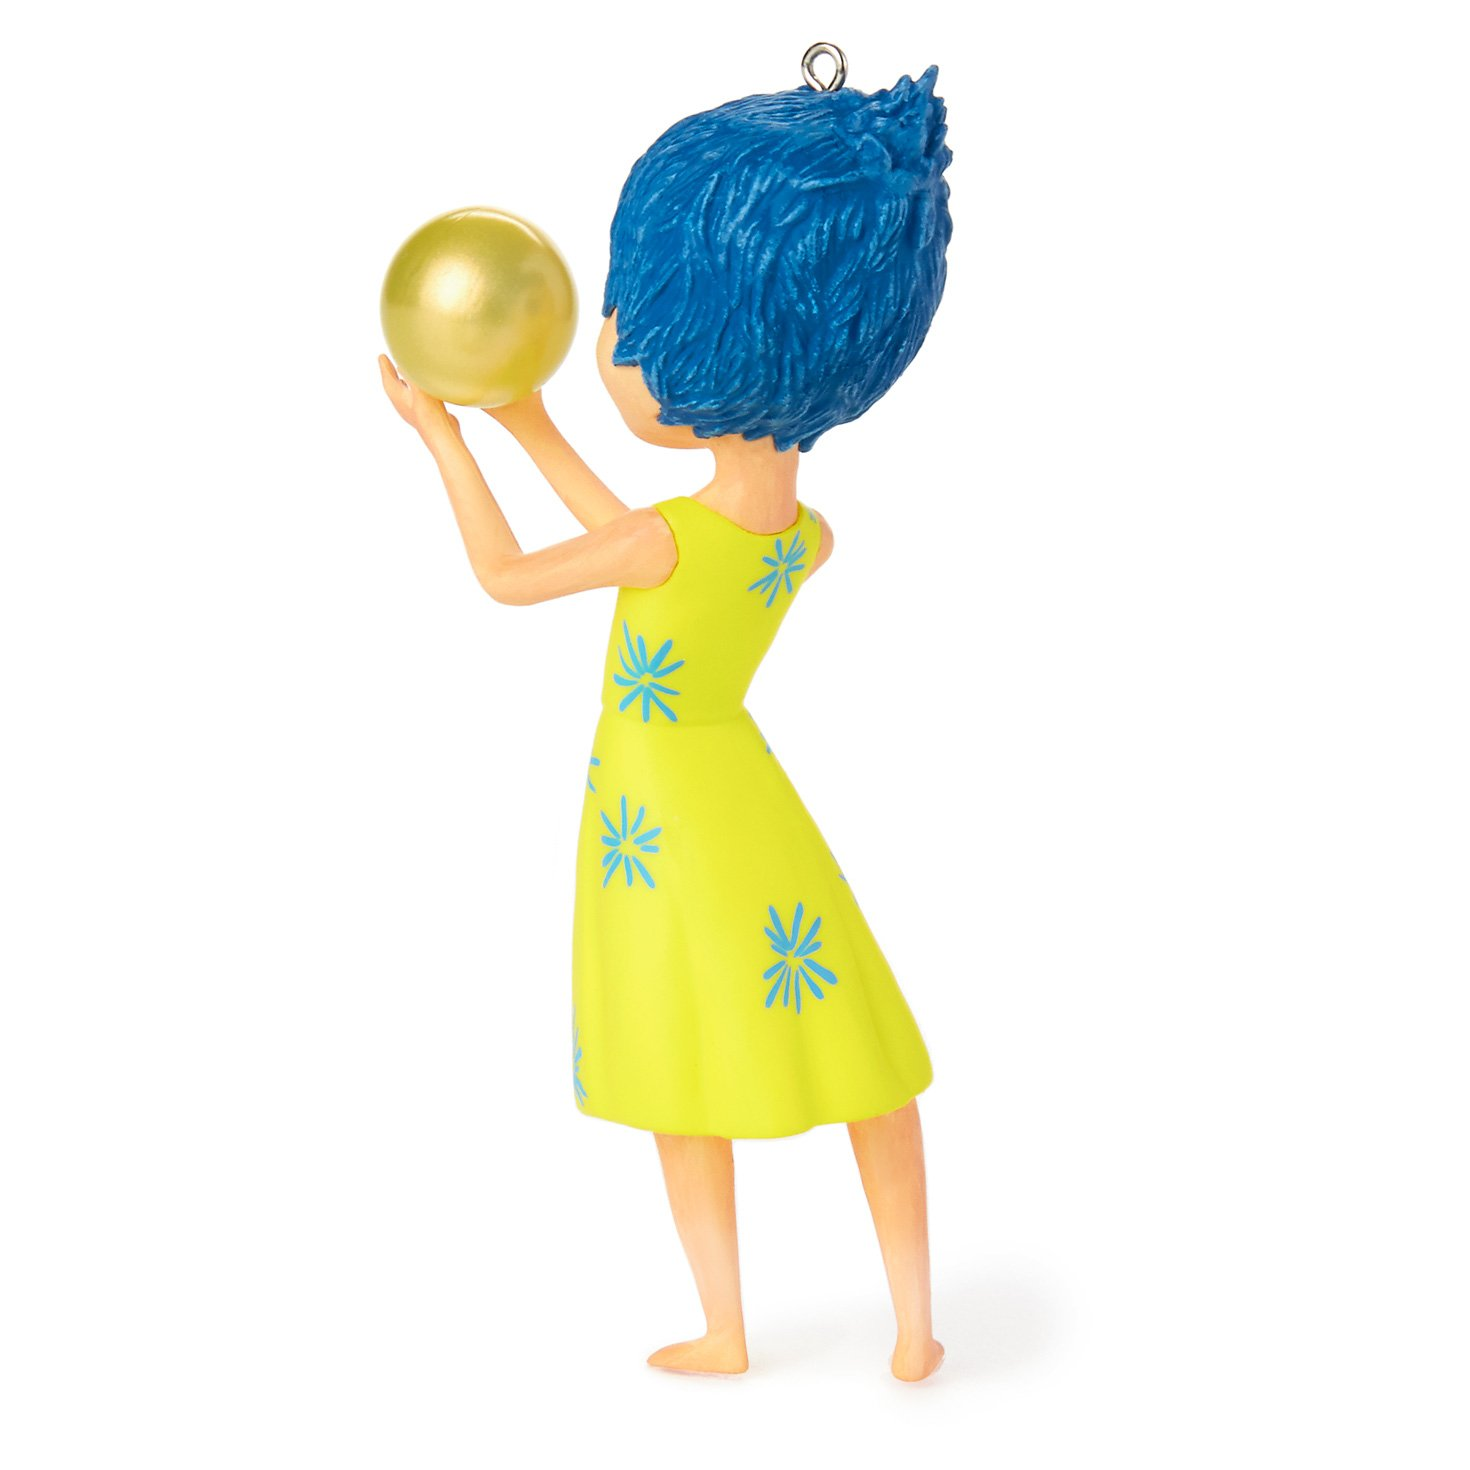 Amazoncom Hallmark Keepsake Ornament Disneypixar Inside Out Joy Home &